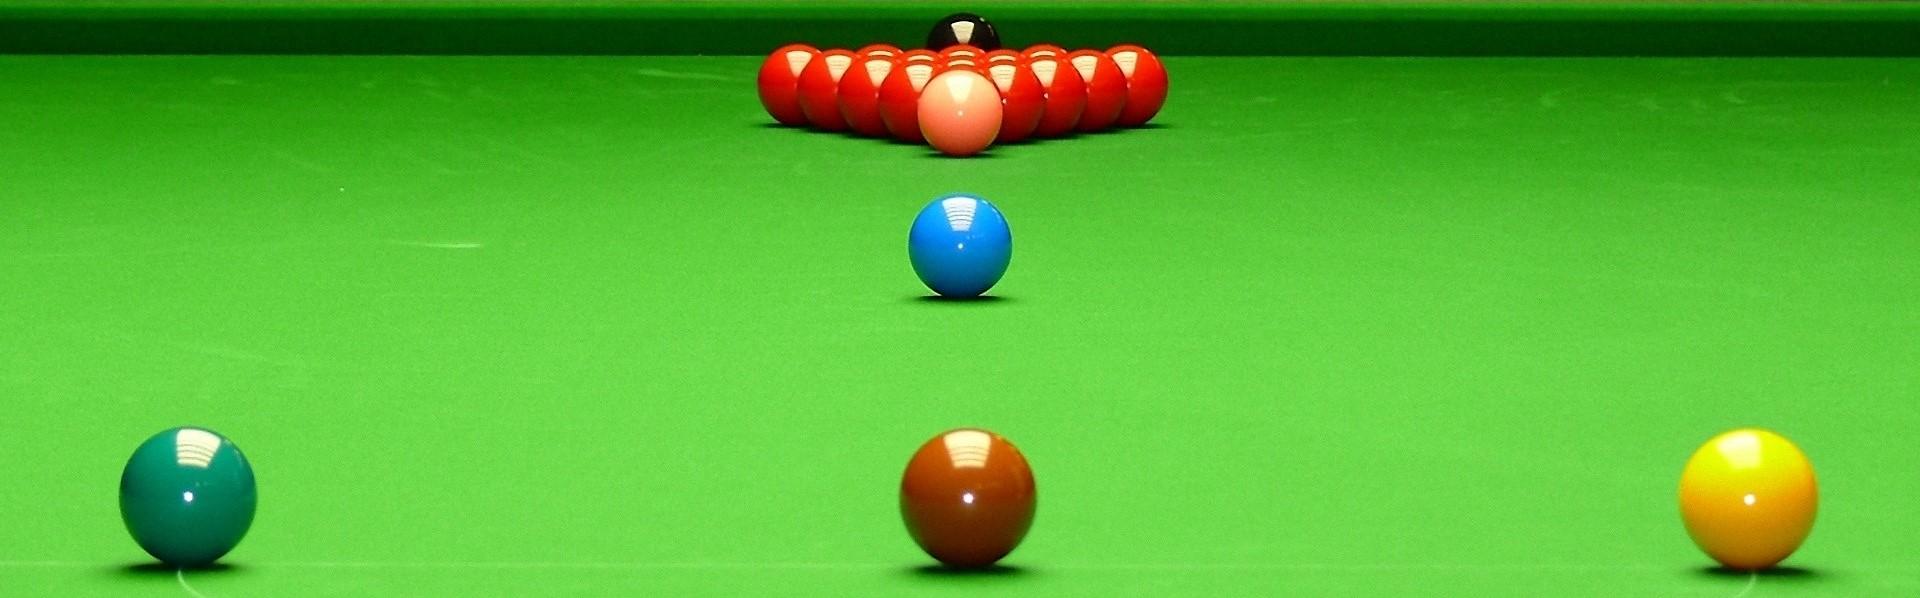 snooker-ready_91881-1920x1200